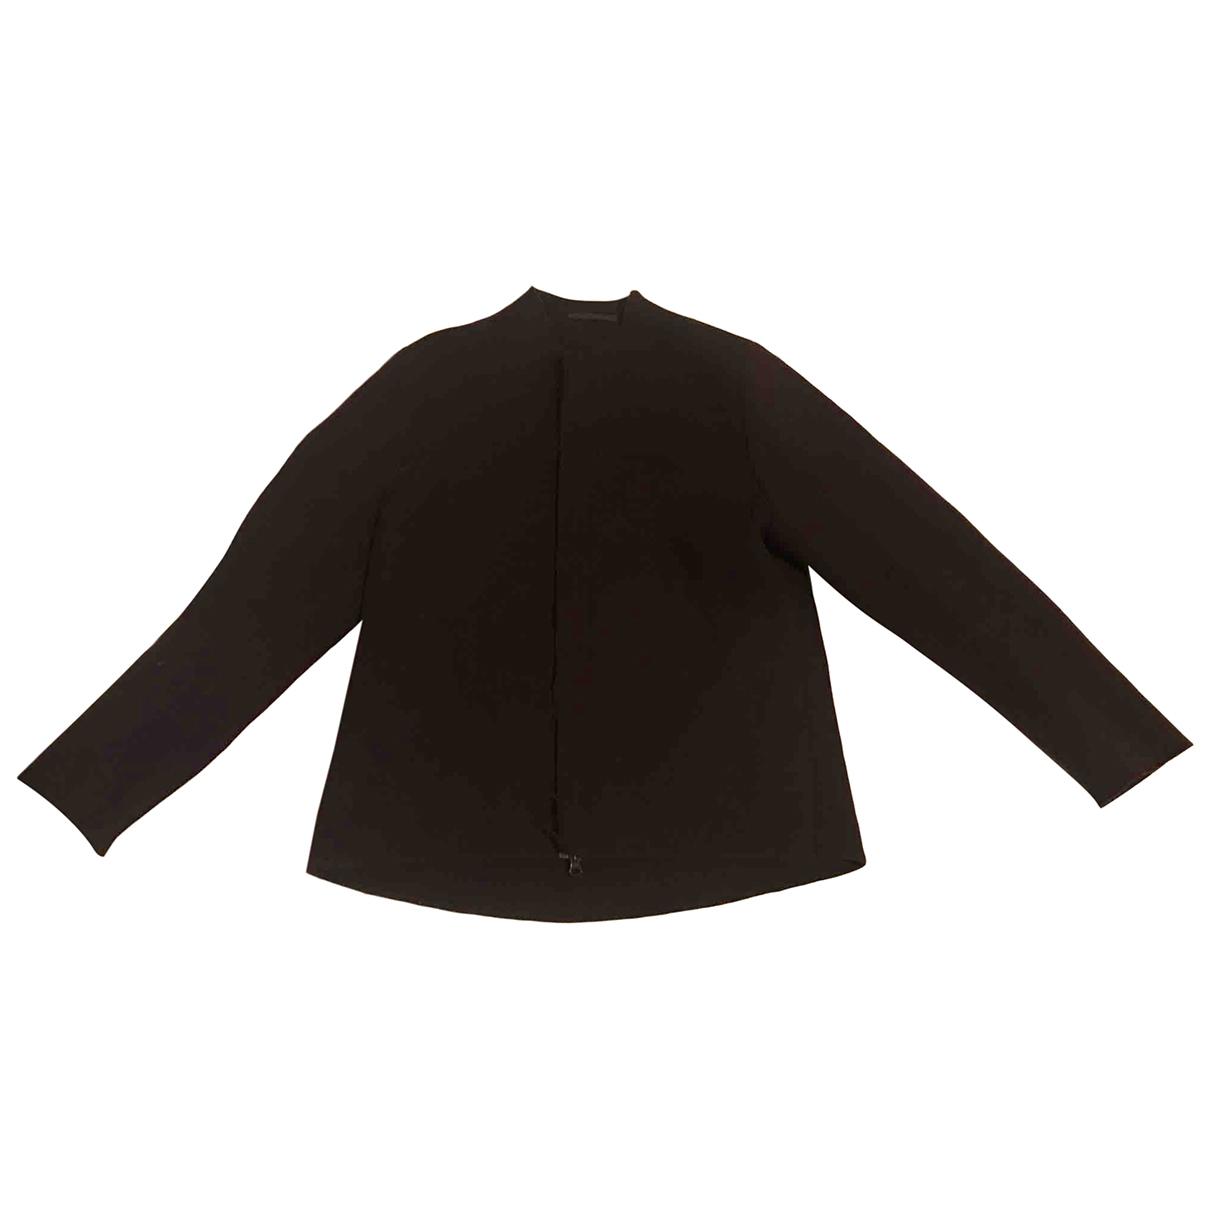 Yohji Yamamoto \N Burgundy Wool jacket for Women S International